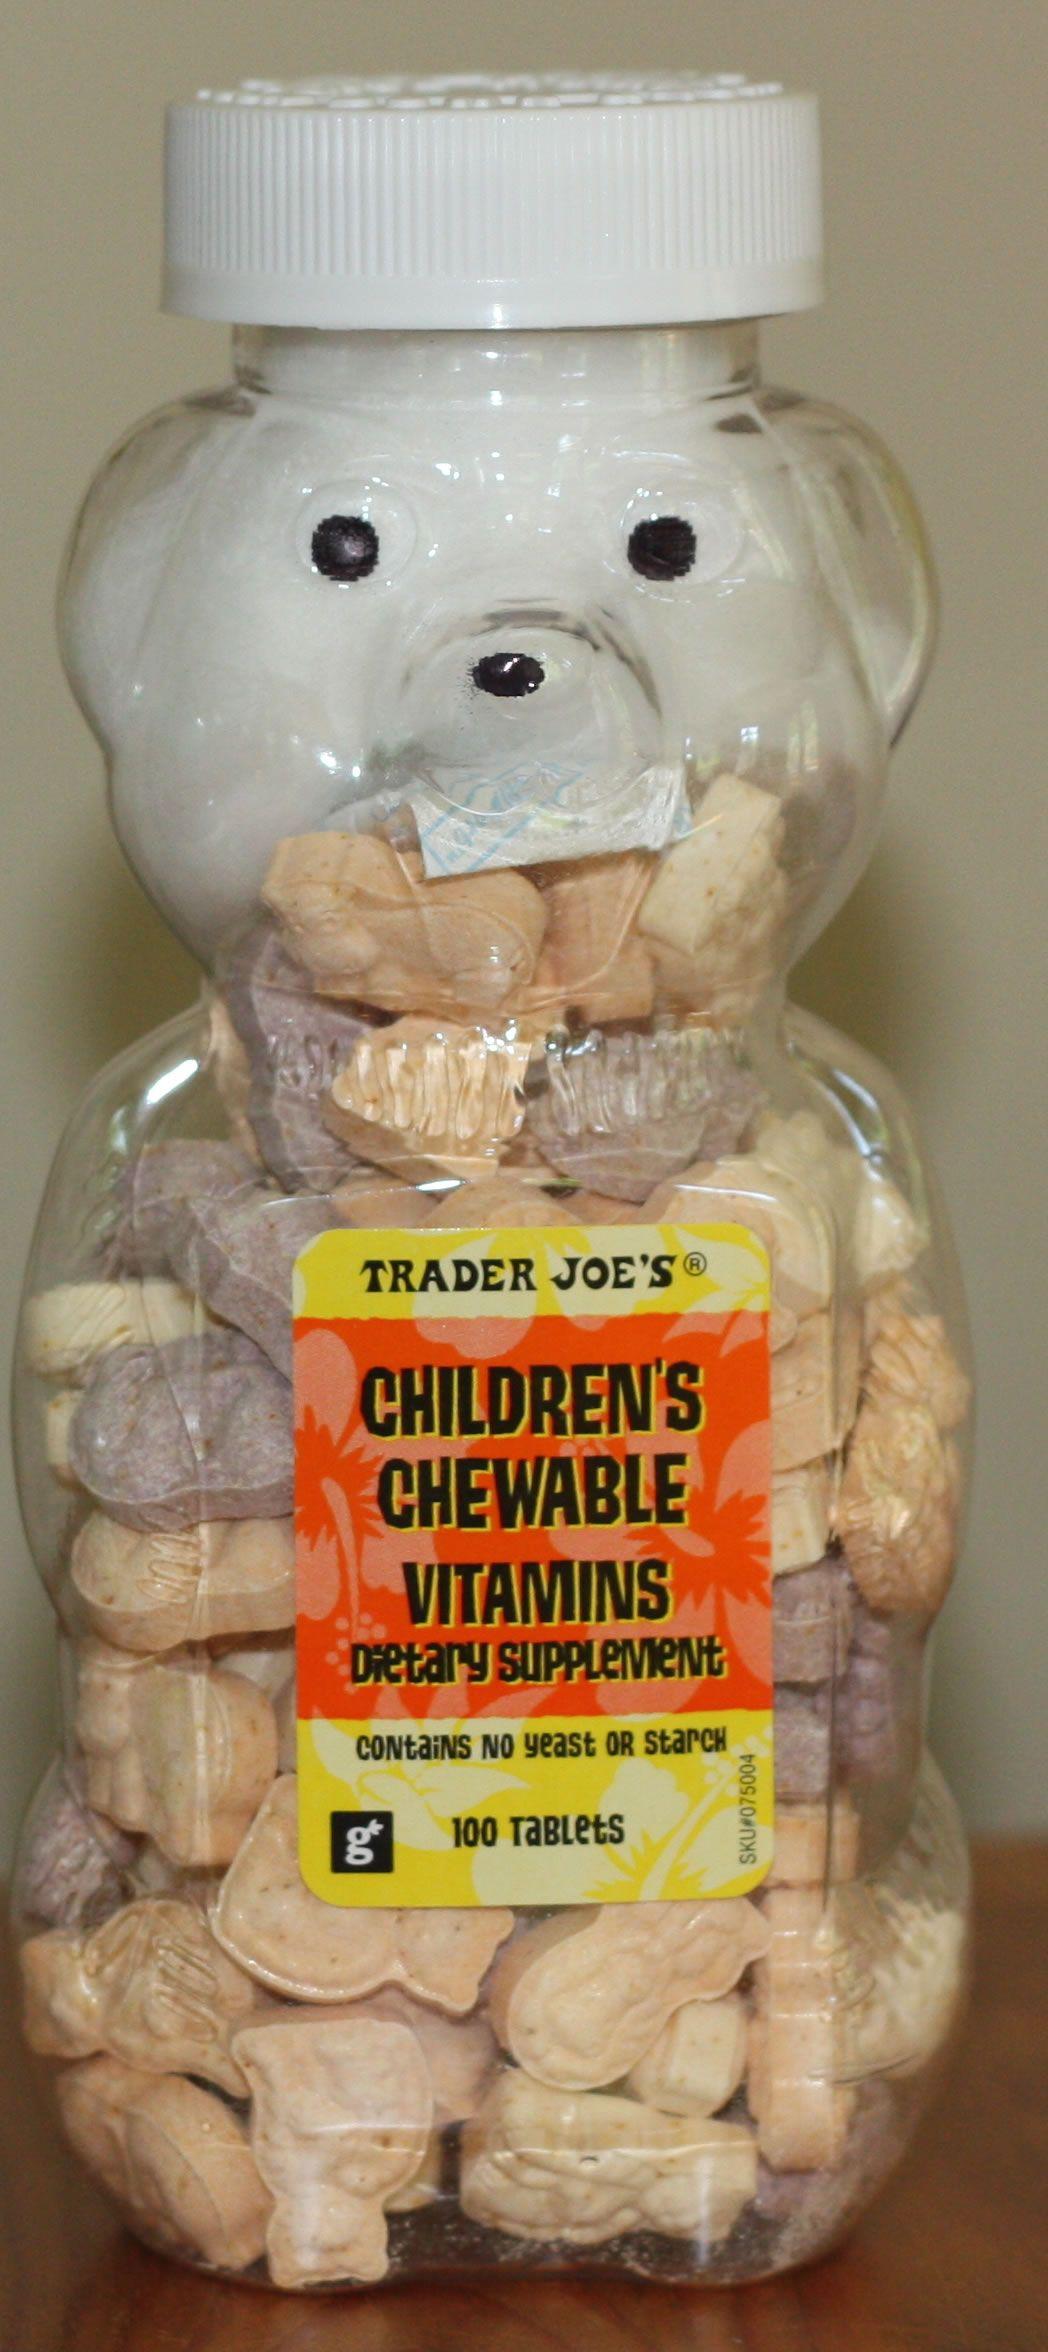 Childrens Chewable Vitamins